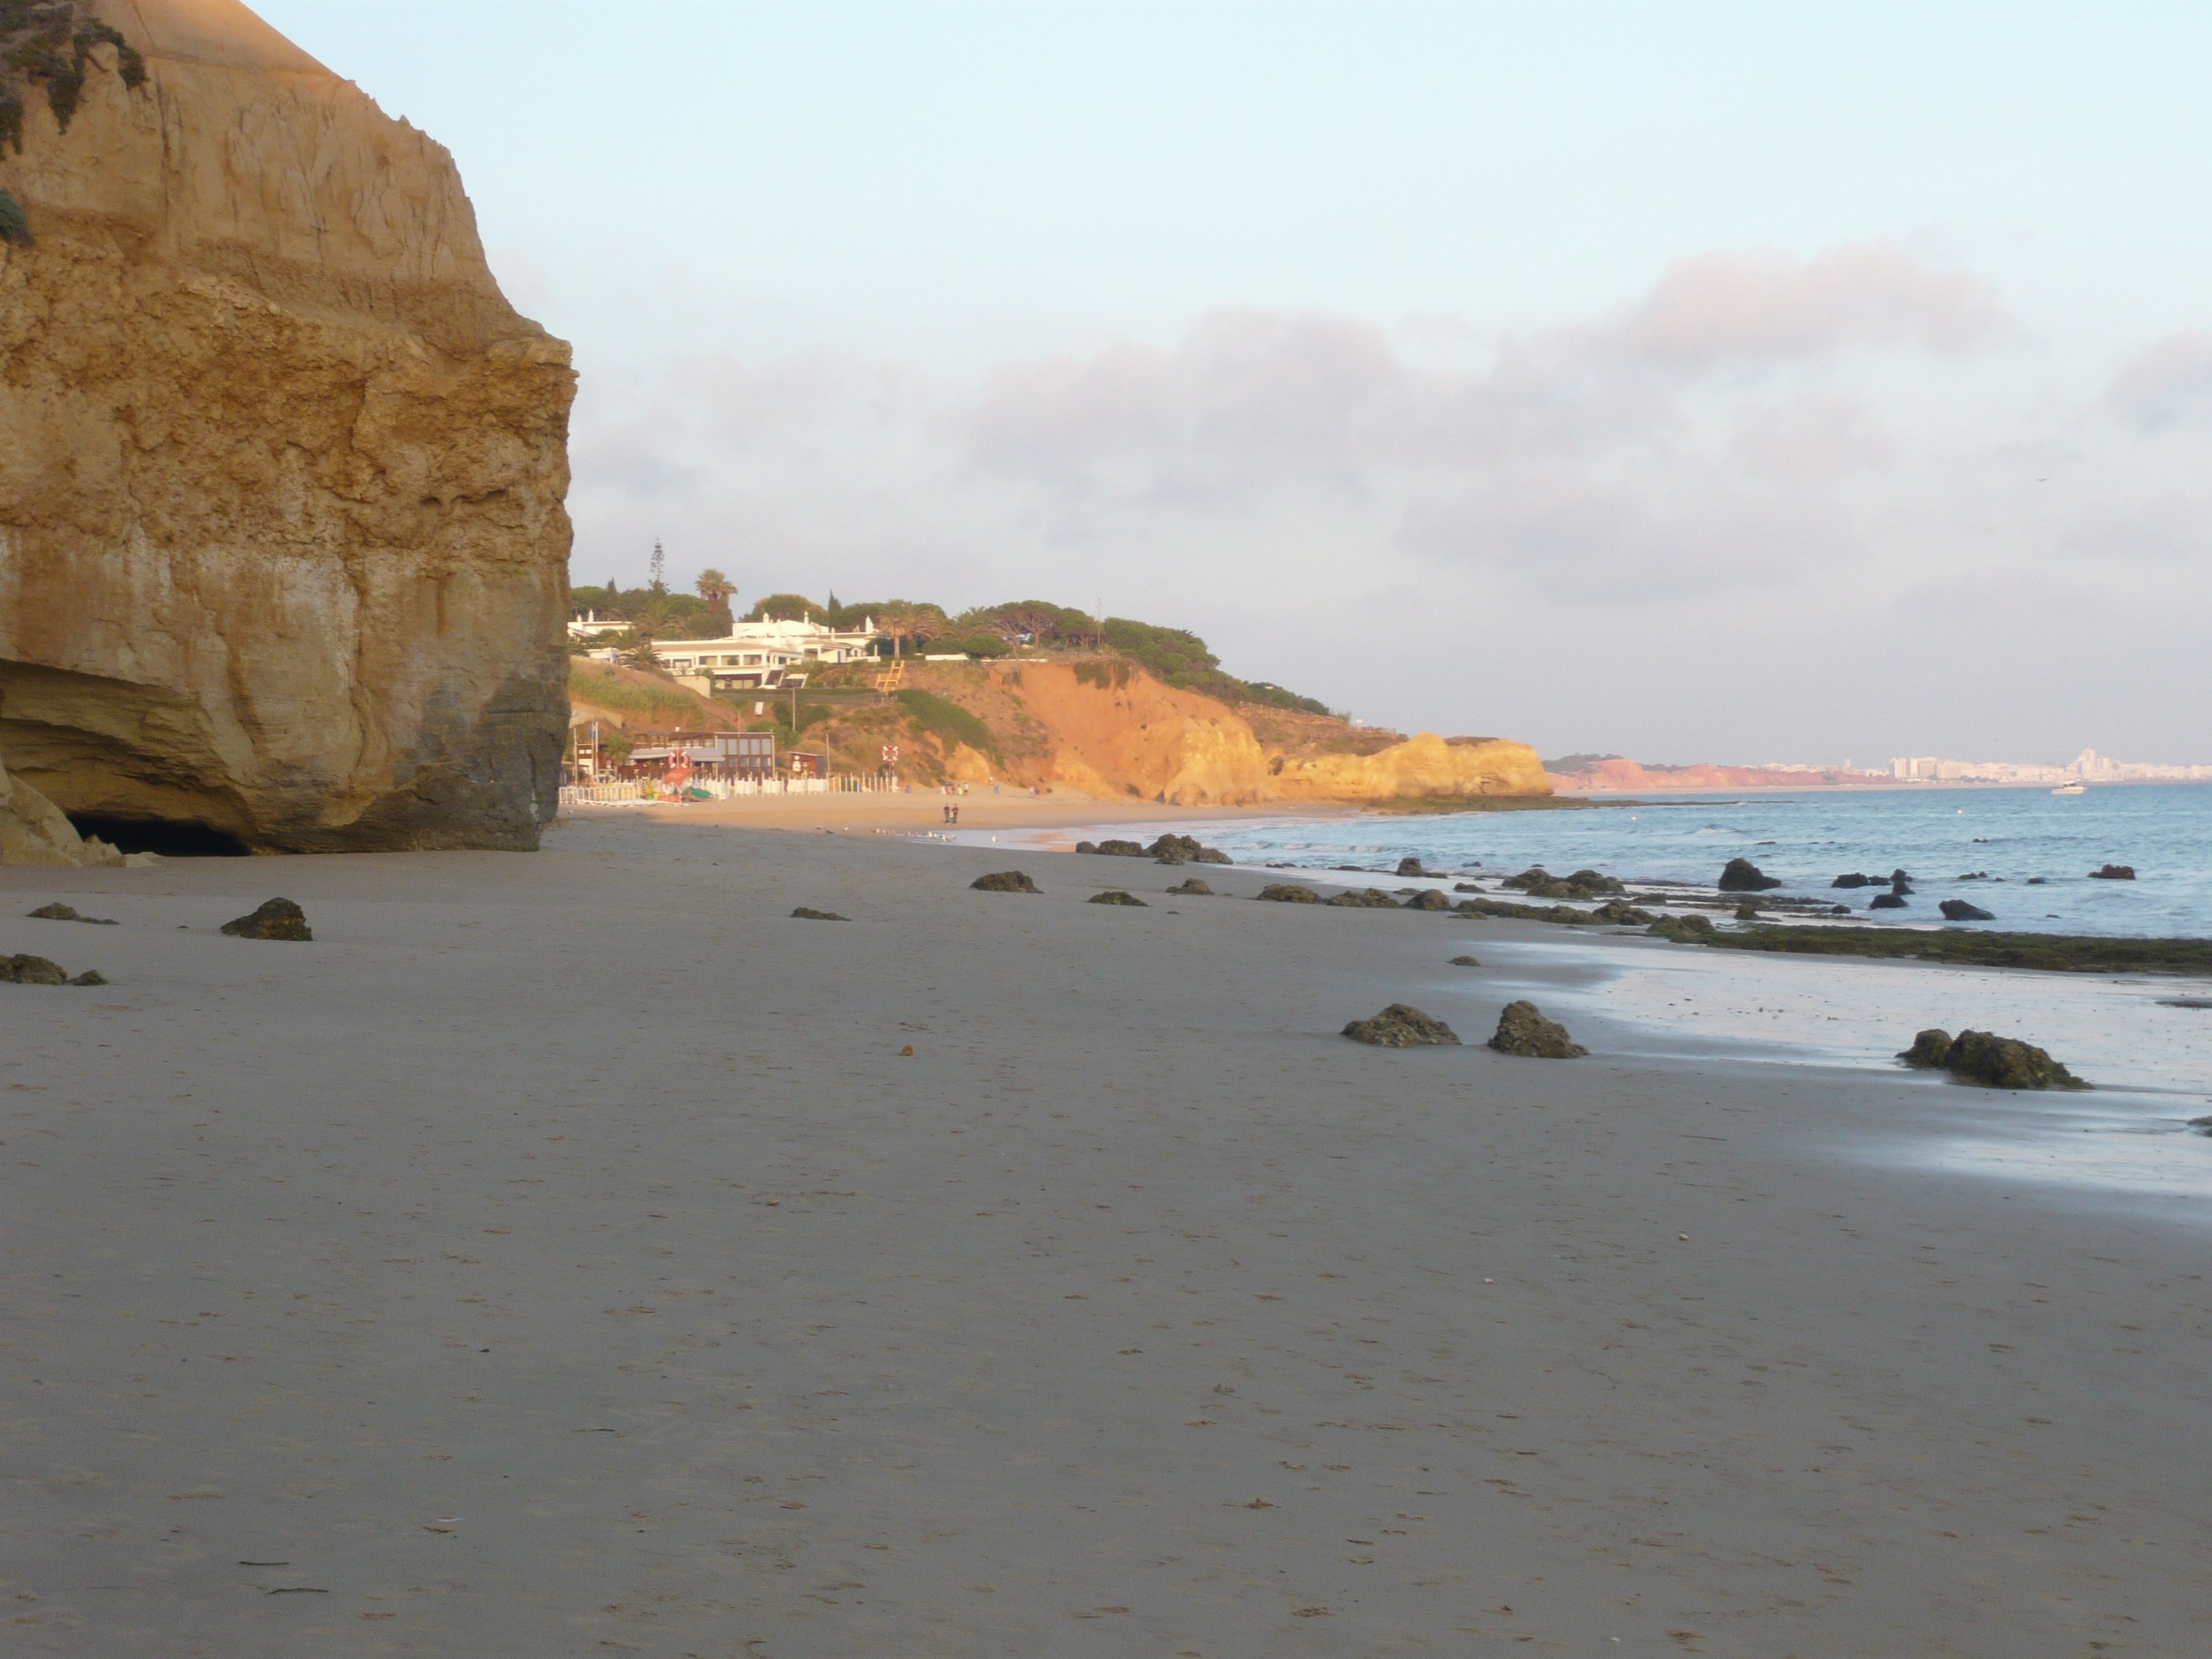 Maria Luisa Beach, Albufeira, Faro District, Portugal